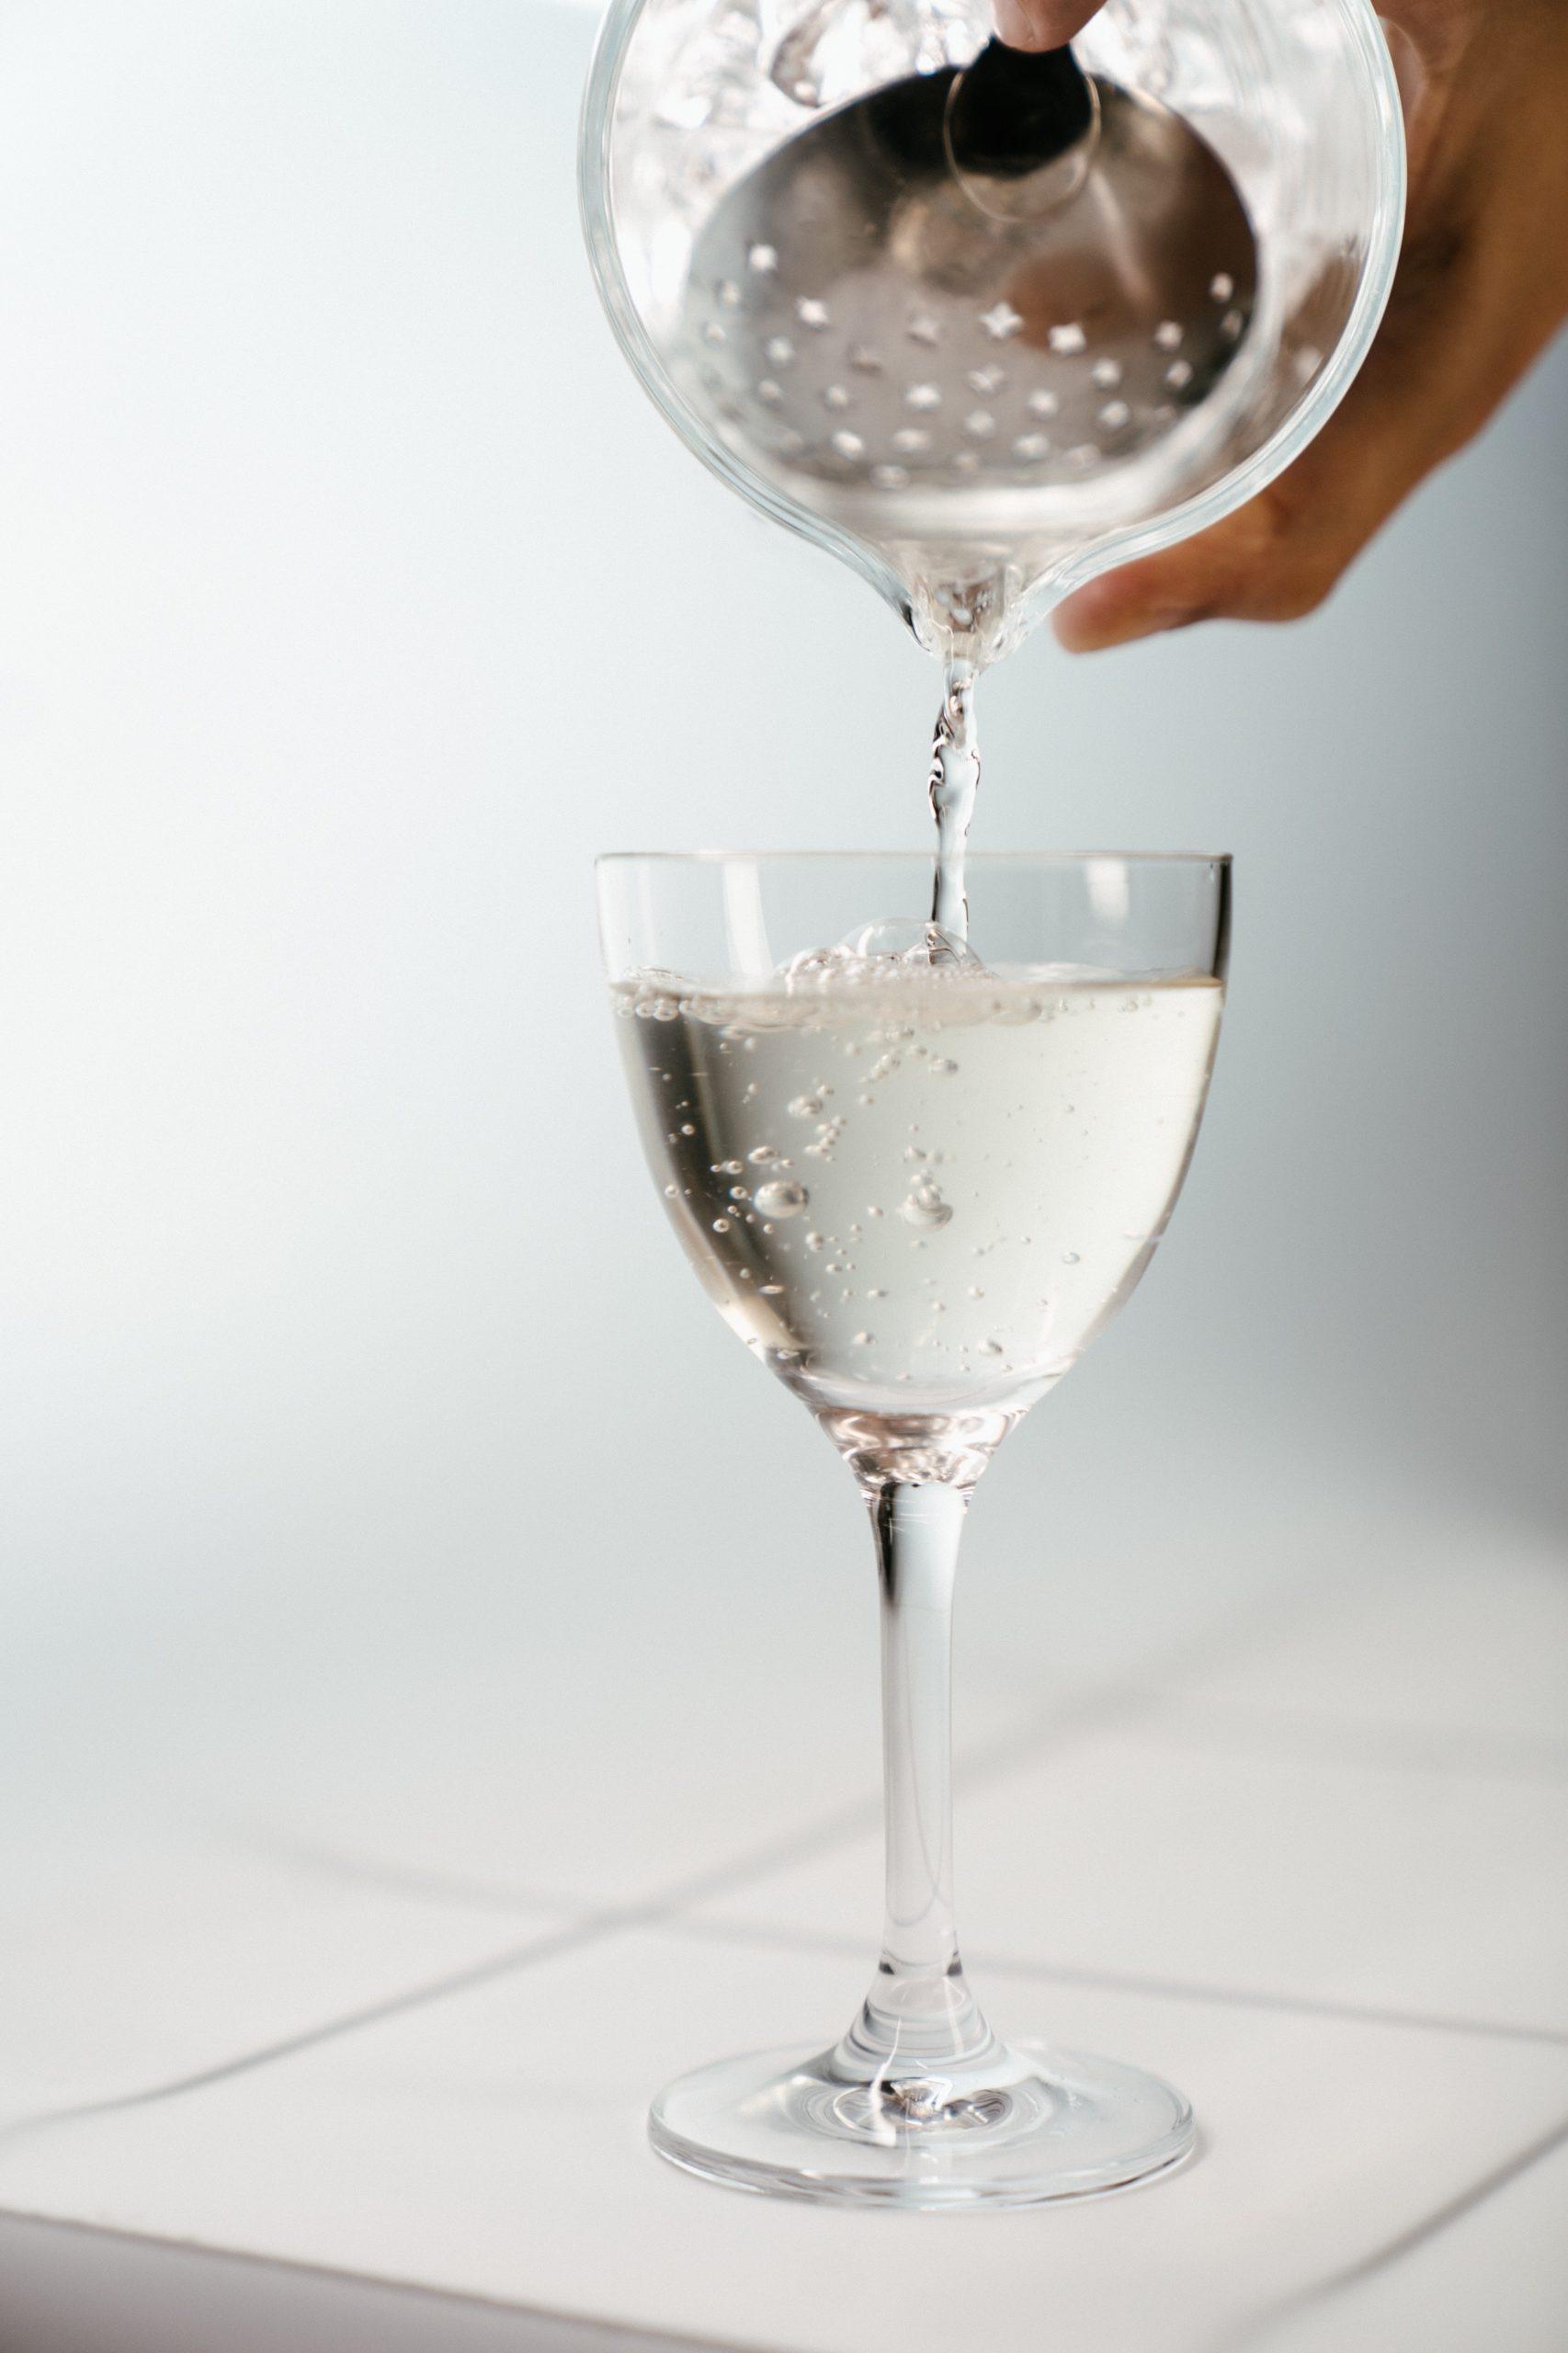 Osoba nalewająca Vodka Martini